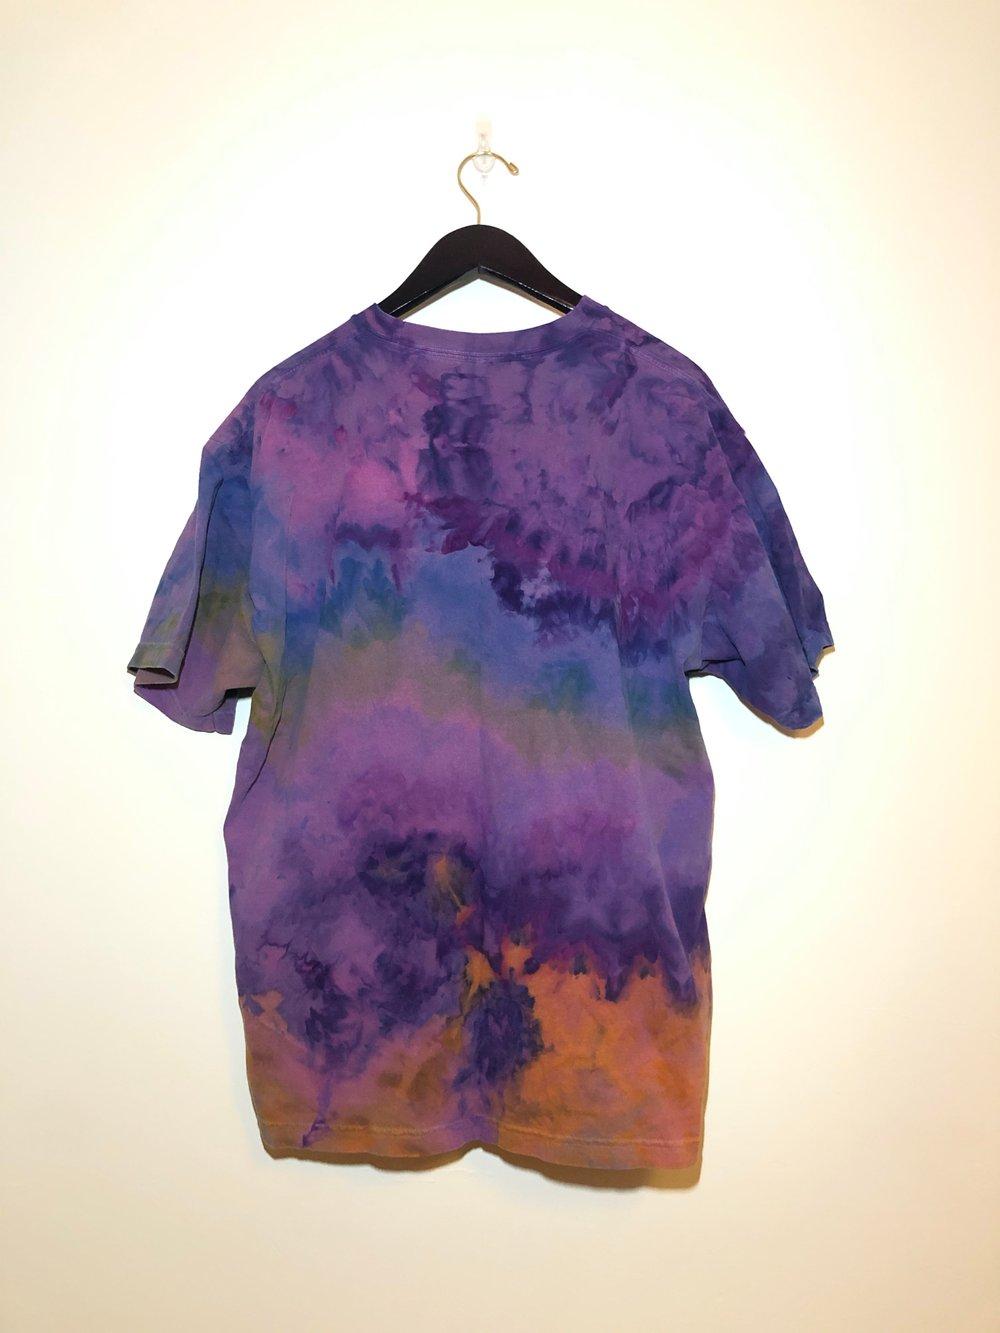 Shirt #5 - Large